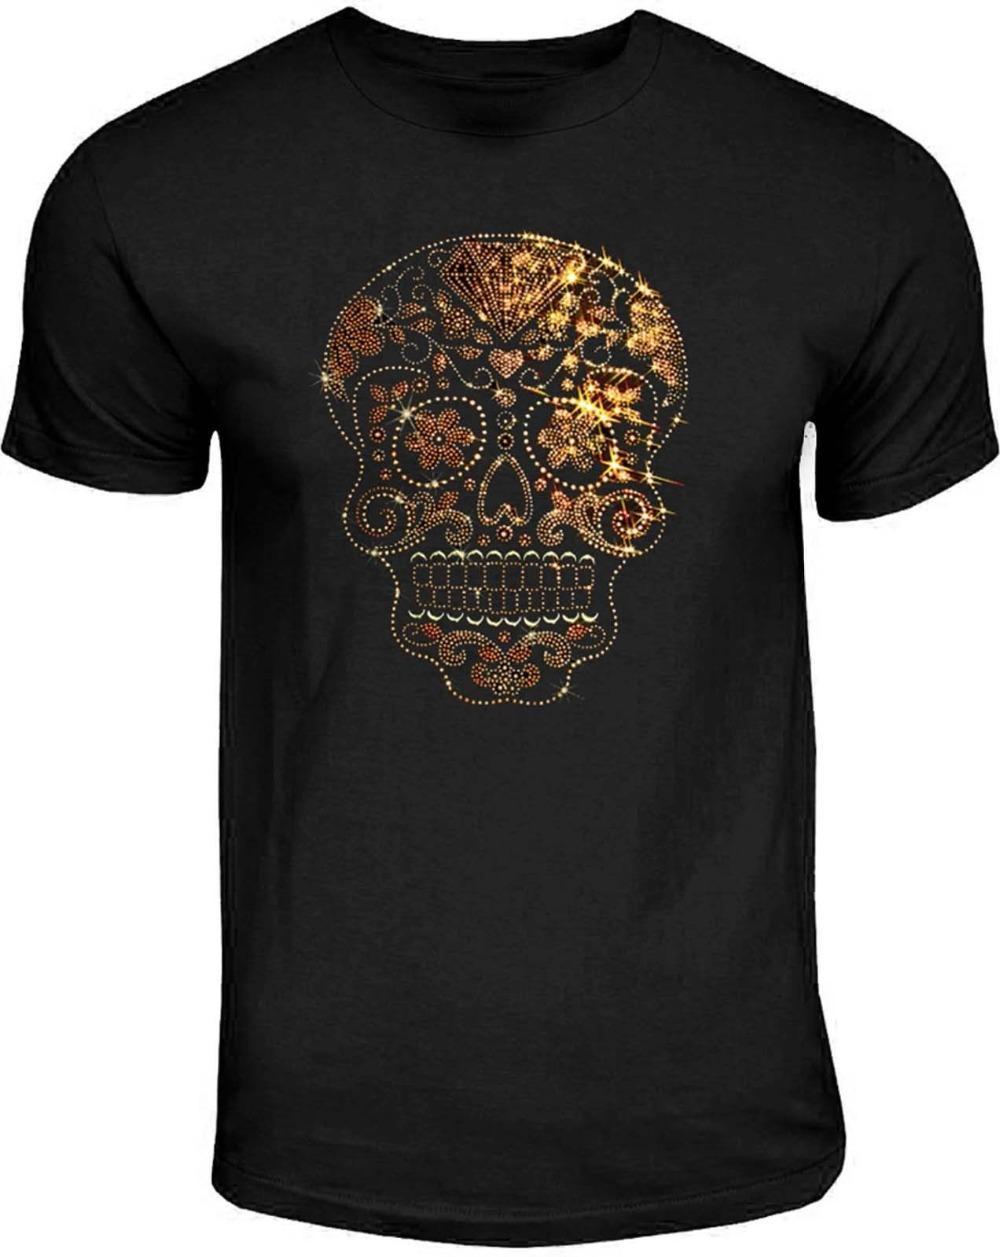 933f27c4b386b6 Cotton Shirts Rhinestone Studs Sugar Skull T Shirt Mens Gold On Gold Candy  Skull Tee S To 4xl Printed T Shirts Men S Streetwear T Shirts Designer  Funny Tee ...